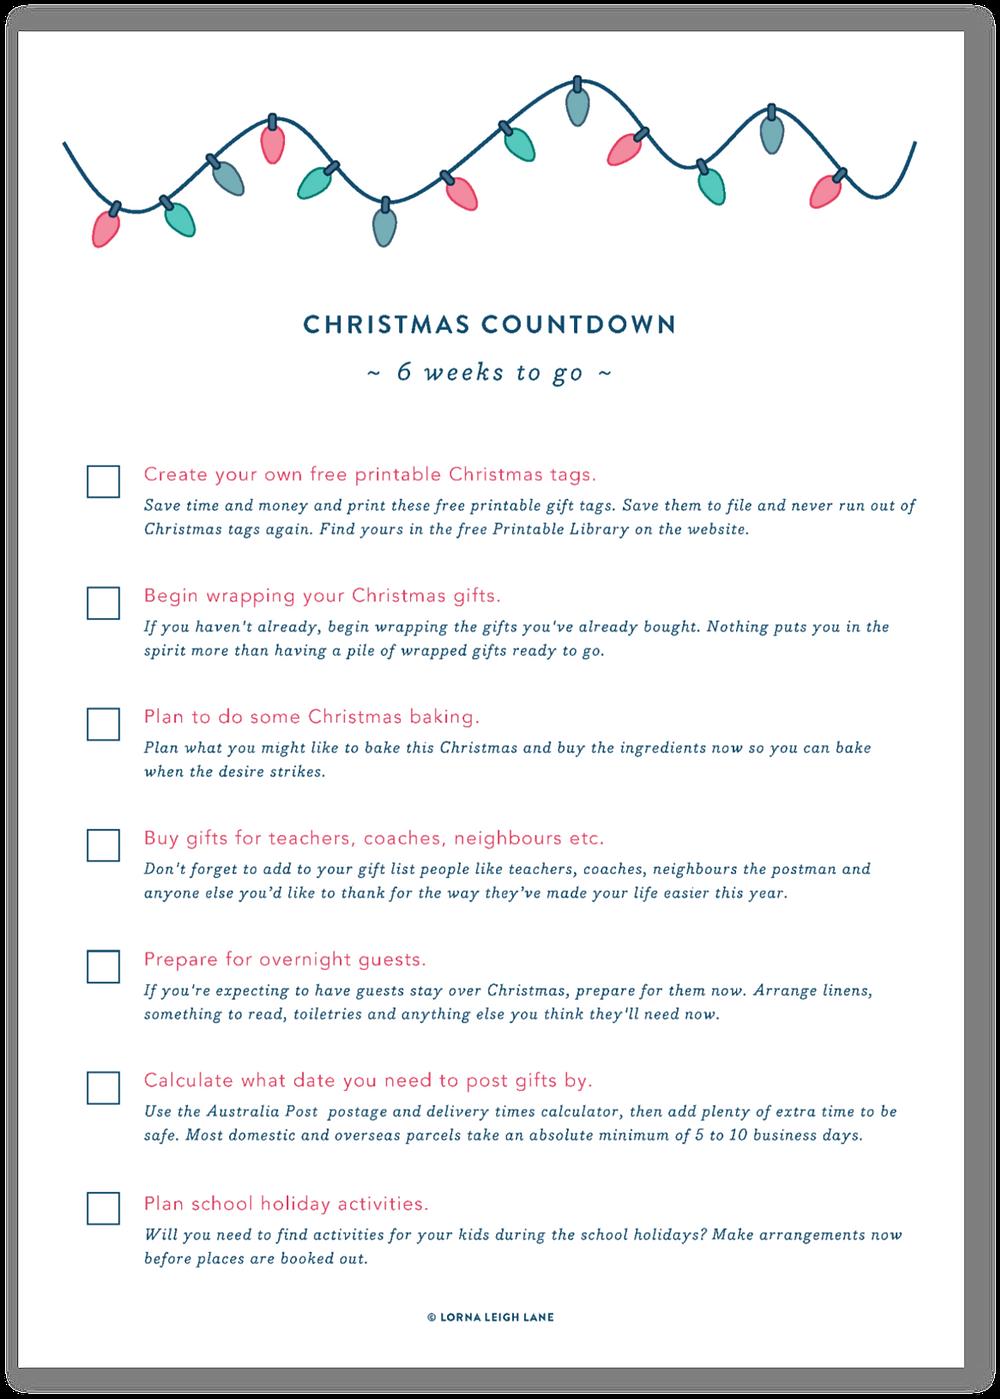 Christmas Countdown - 6 weeks to go